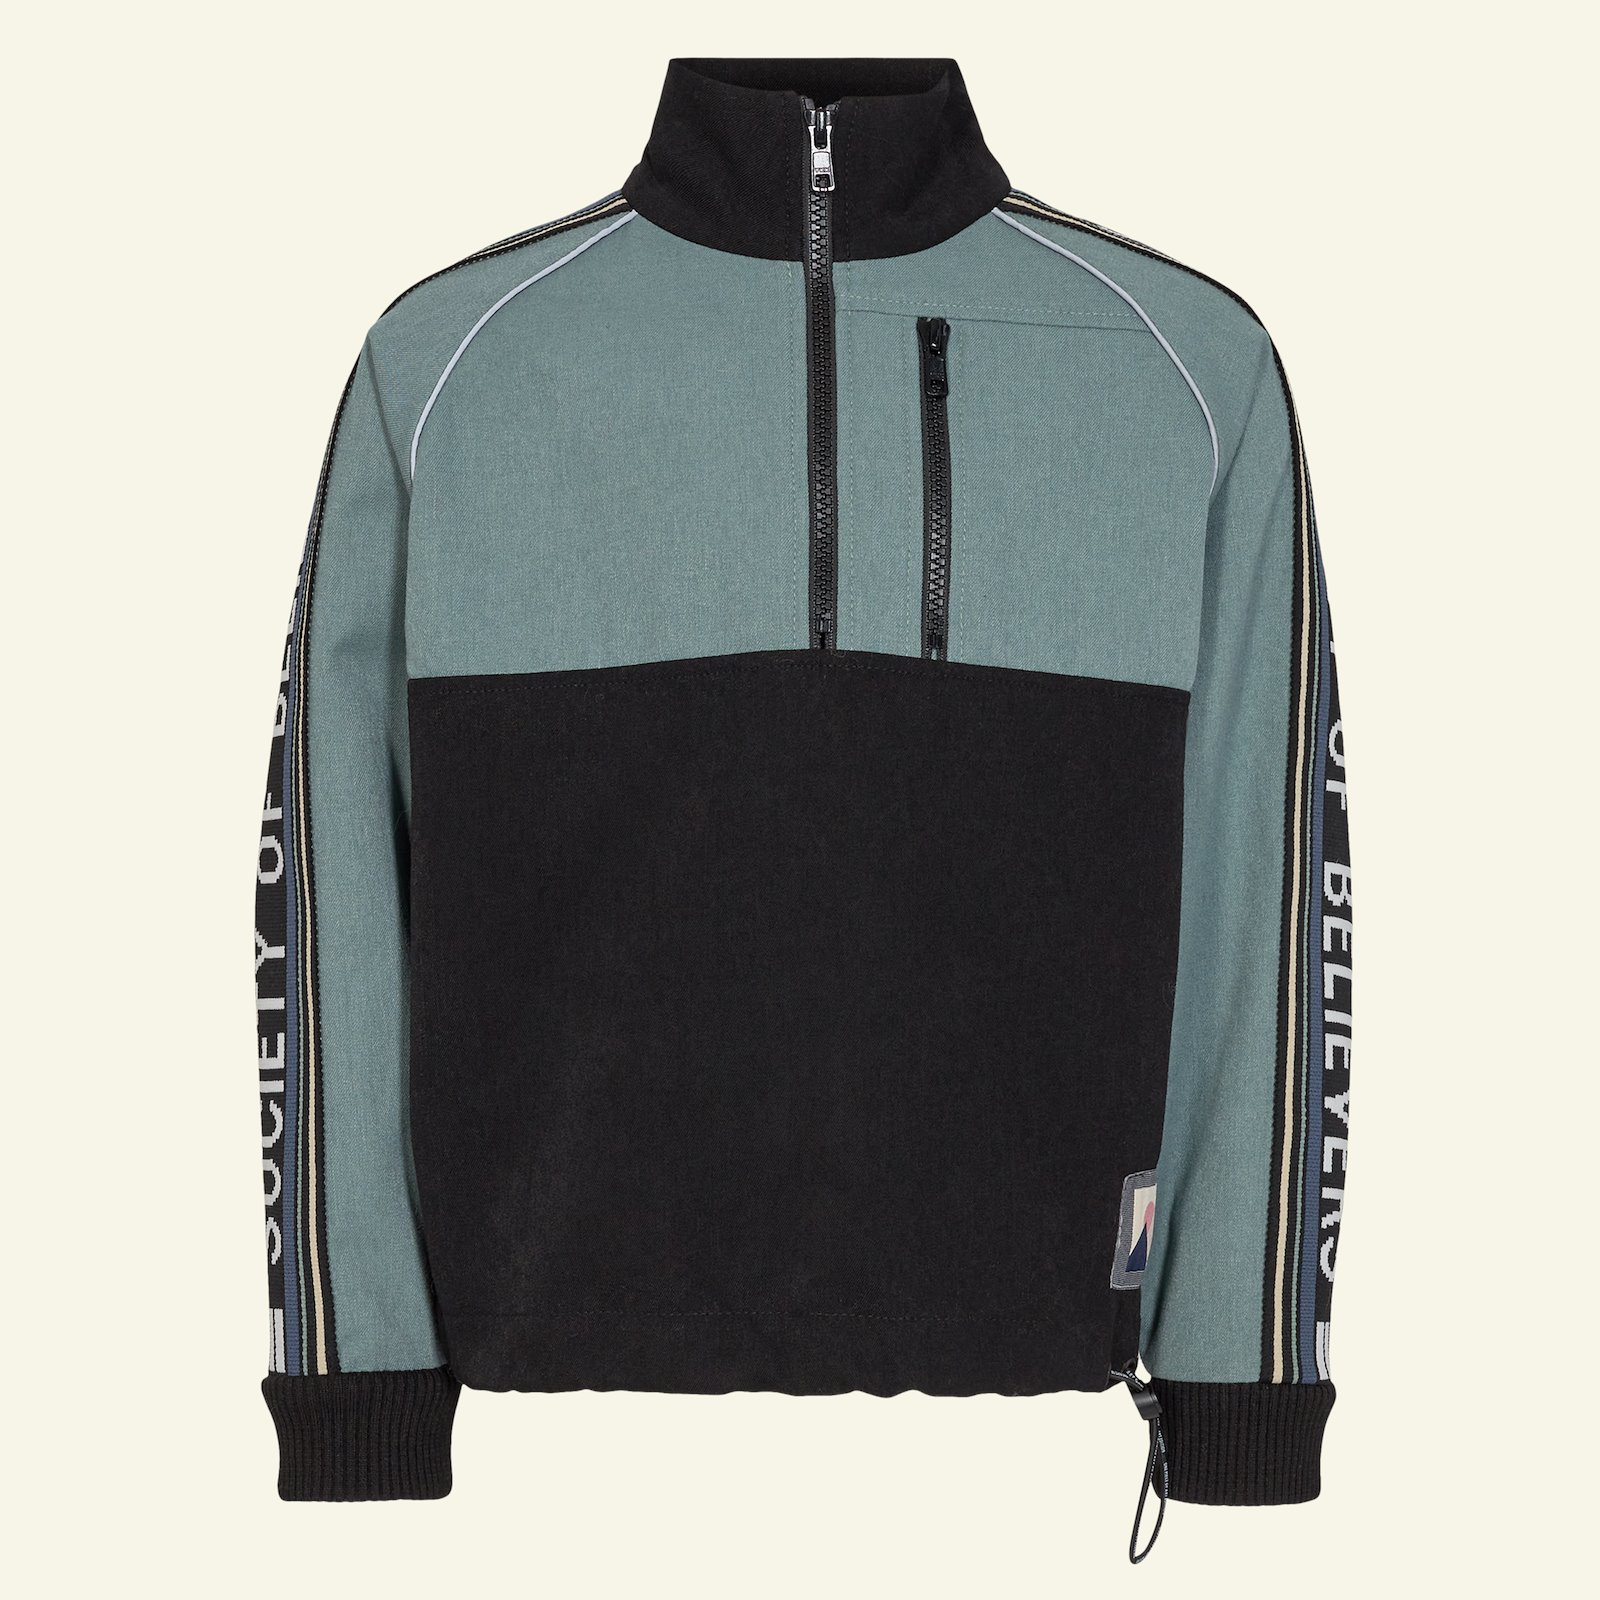 Anorak and jacket, 140/10y p64020_650744_650746_272436_96077_3509089_72091_sskit